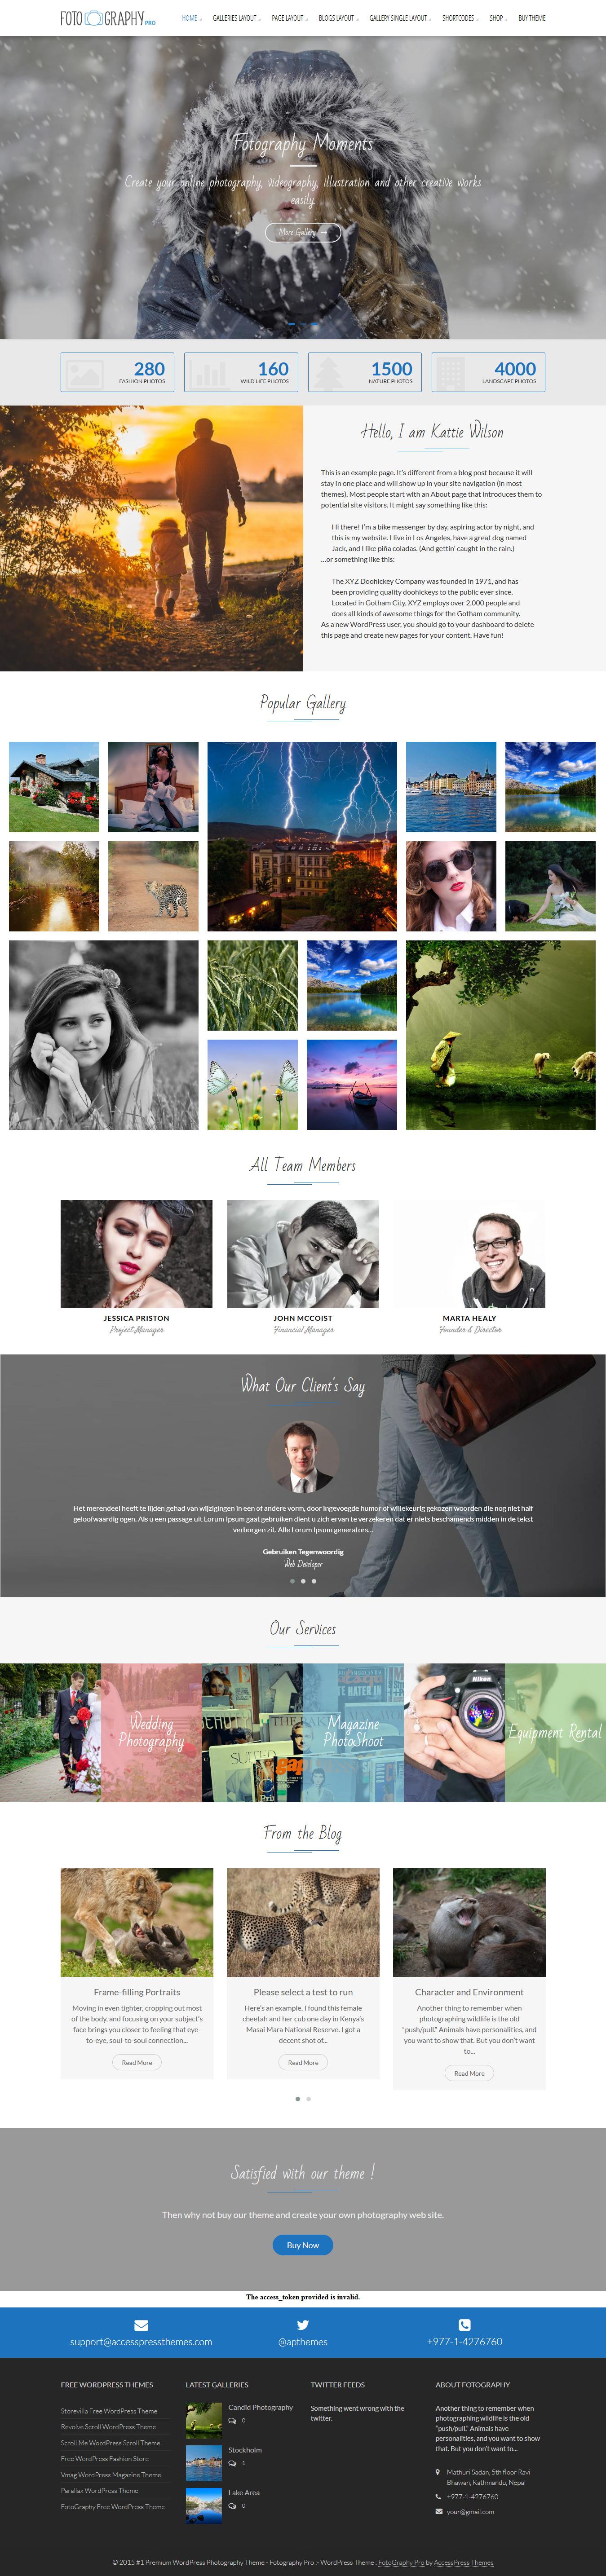 Fotography Pro - Best Premium Responsive WordPress Themes